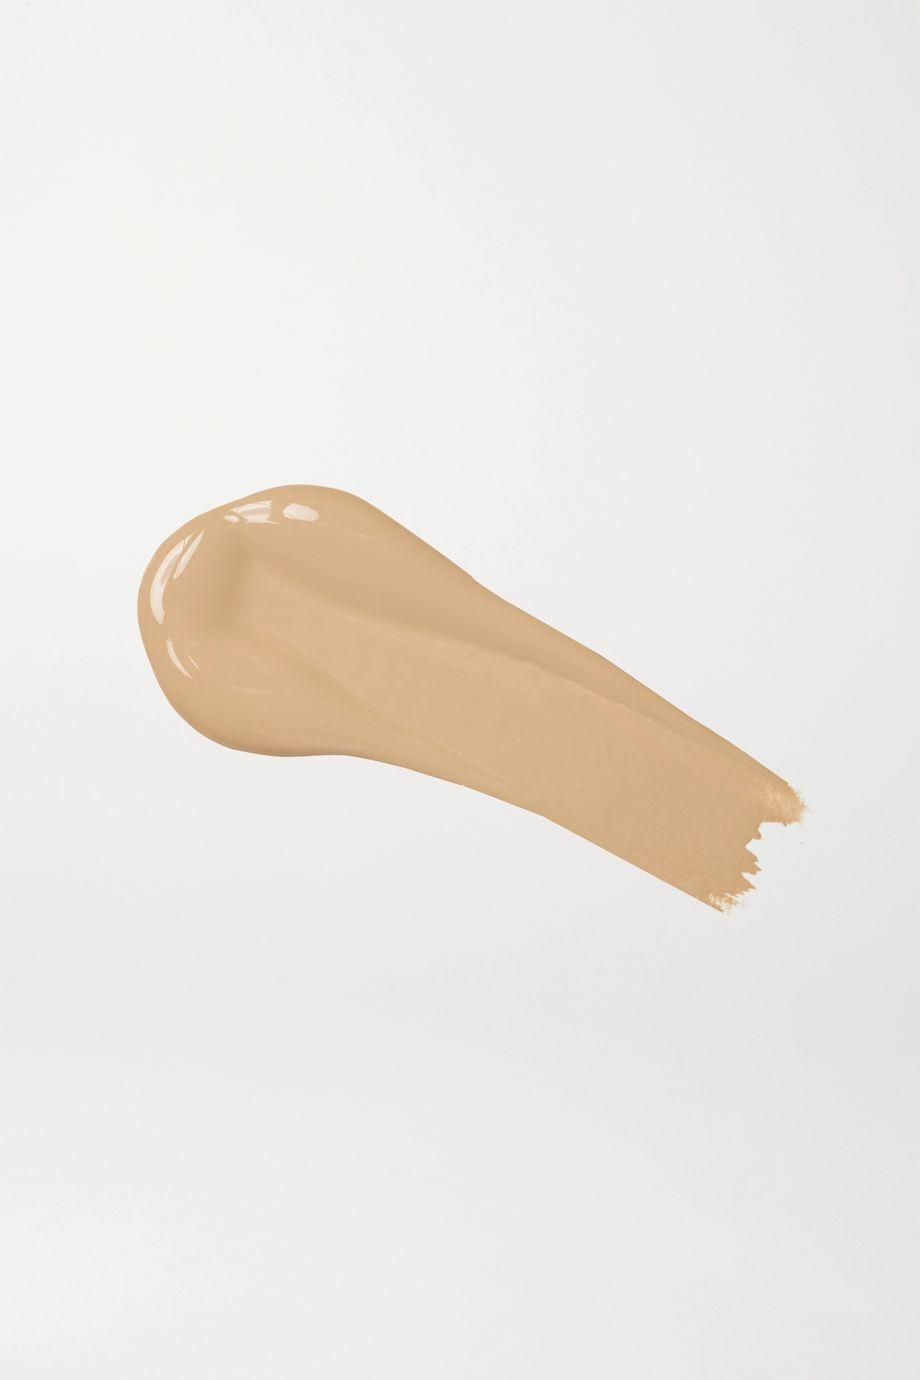 Kosas Revealer Super Creamy + Brightening Concealer - 5.5